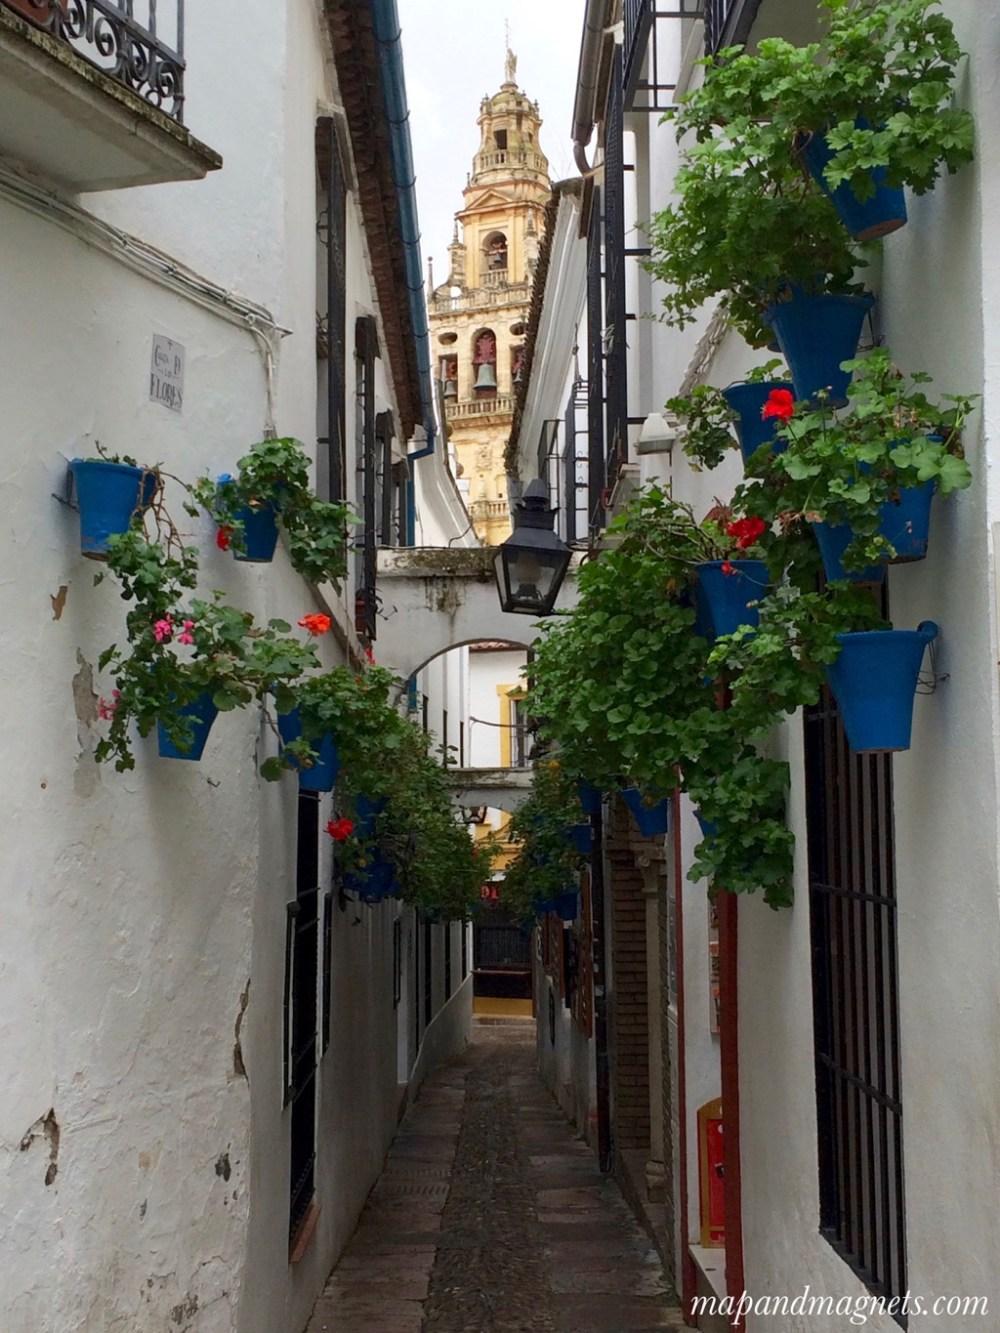 Cordoba streets with Mezquita view